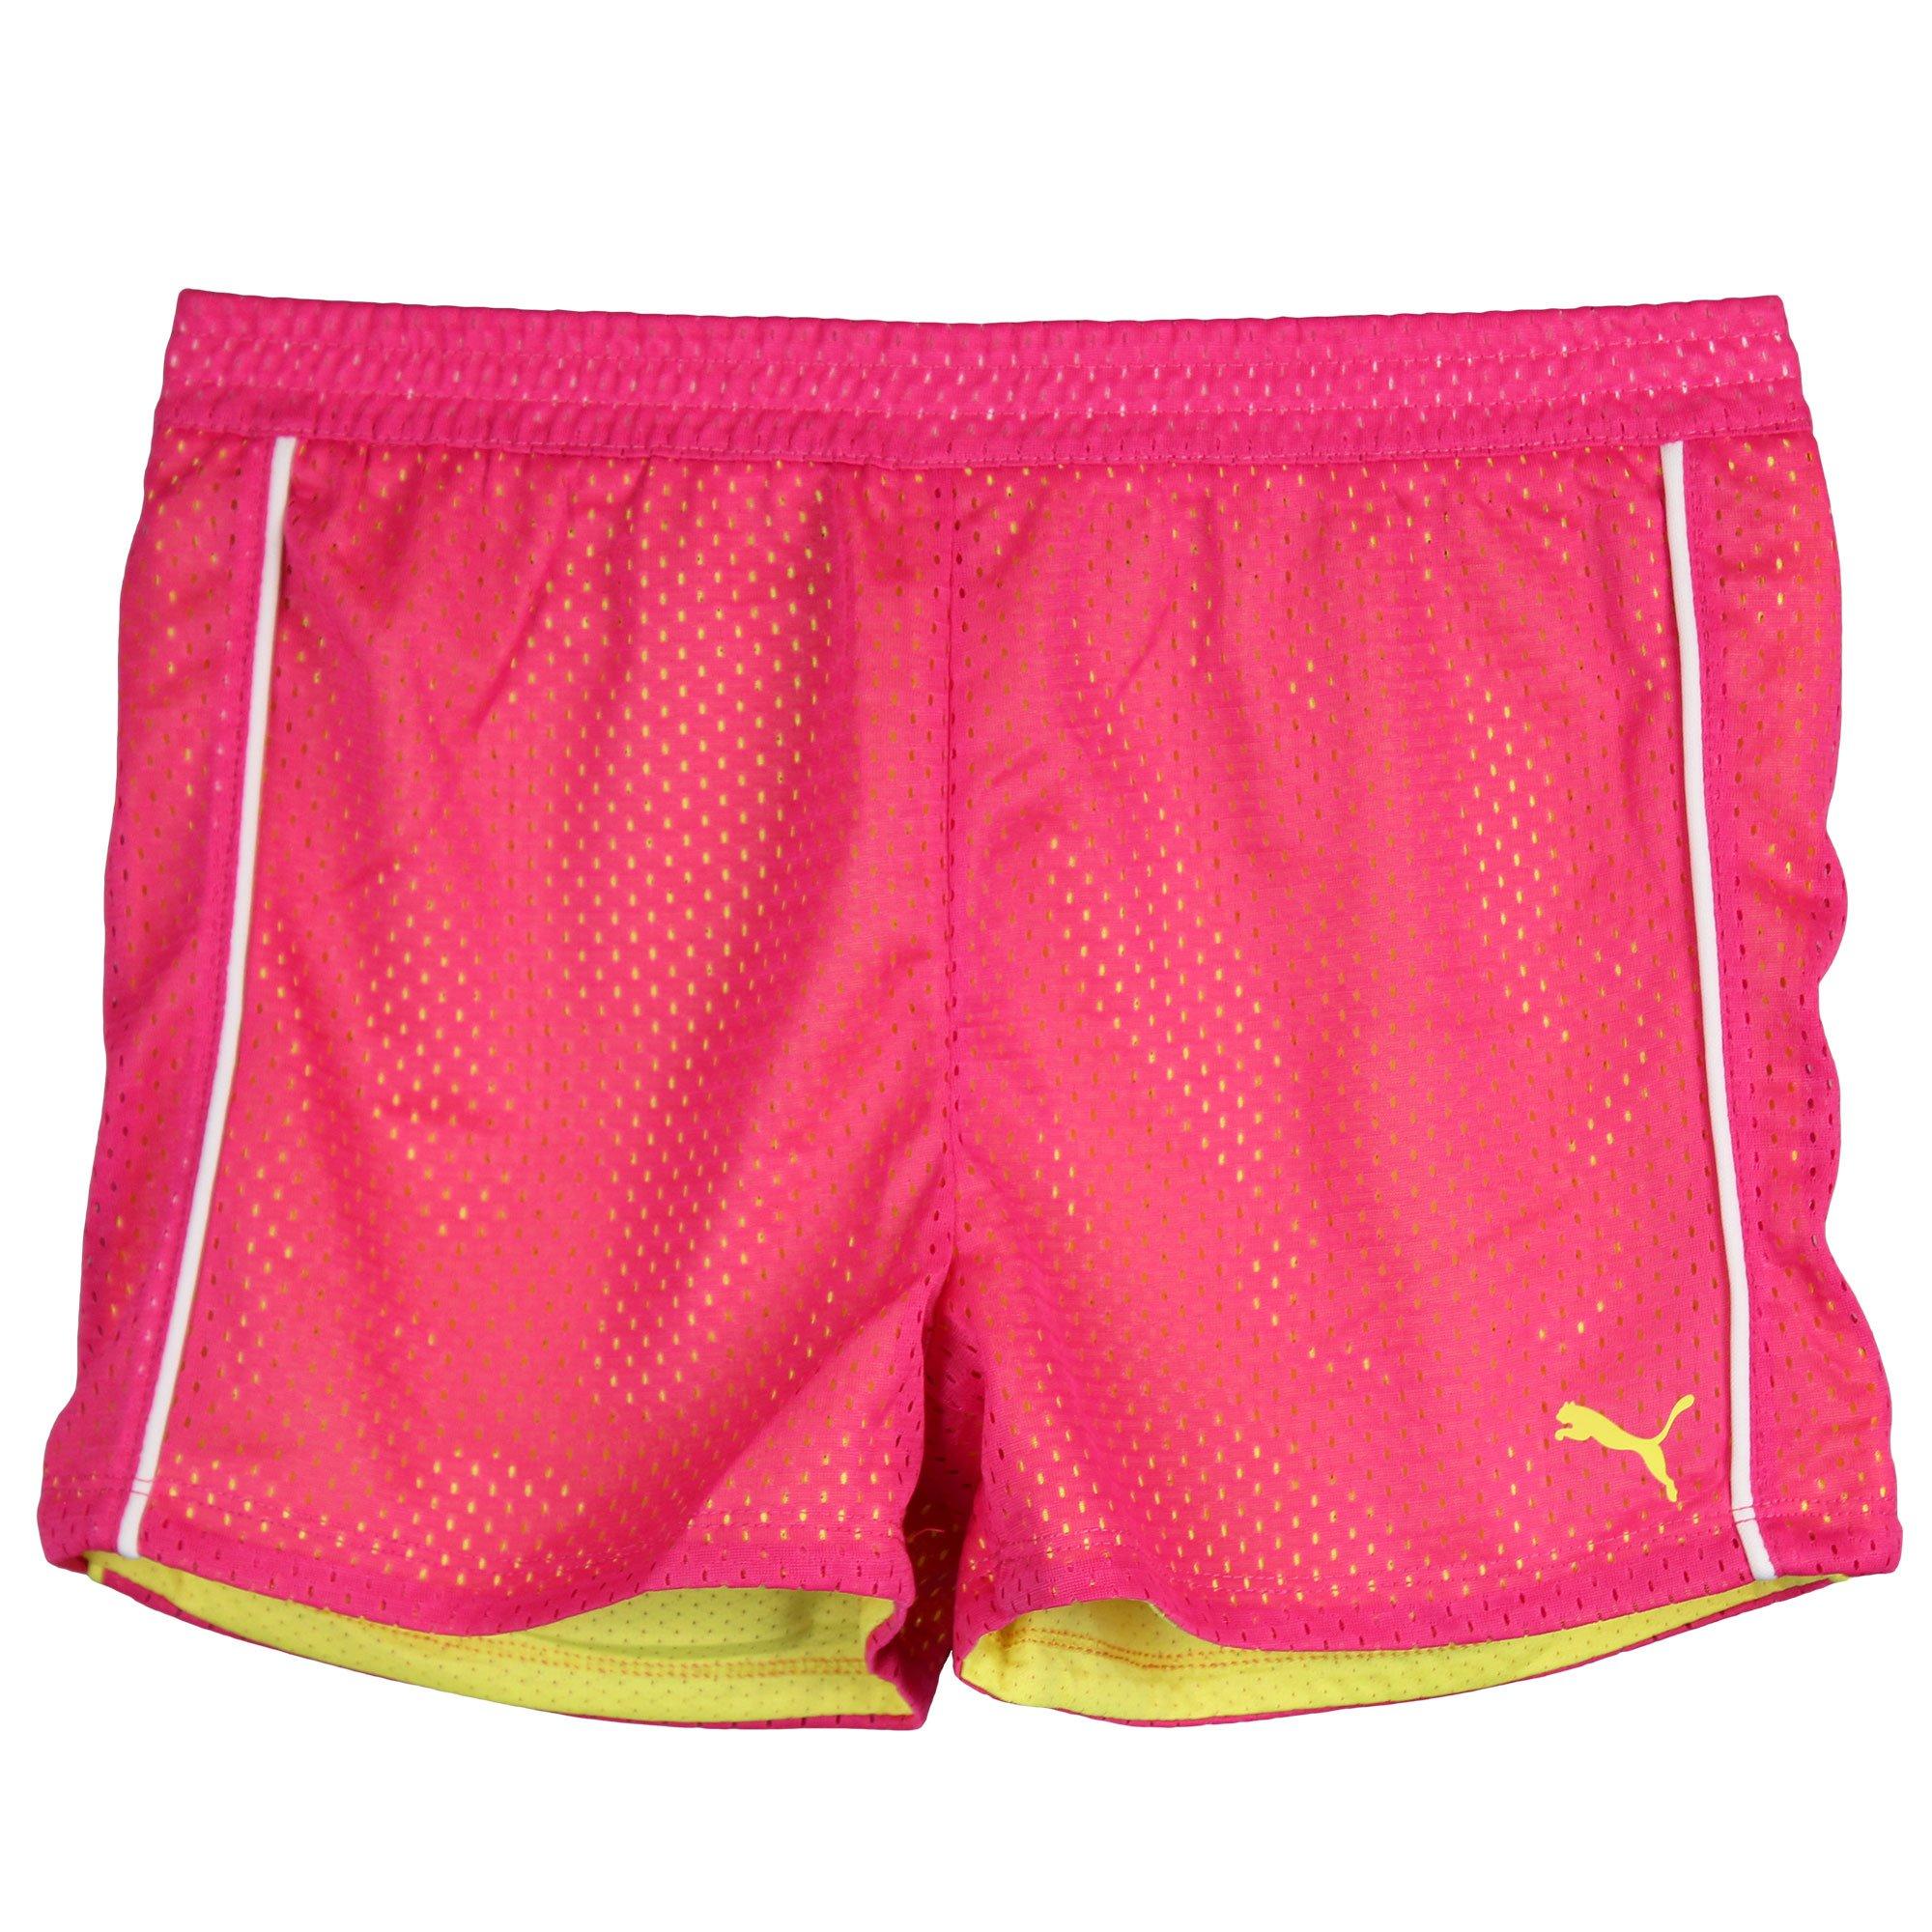 PUMA Little Girls Mesh Athletic Exercise Gym Shorts Pink Yellow White Size 6